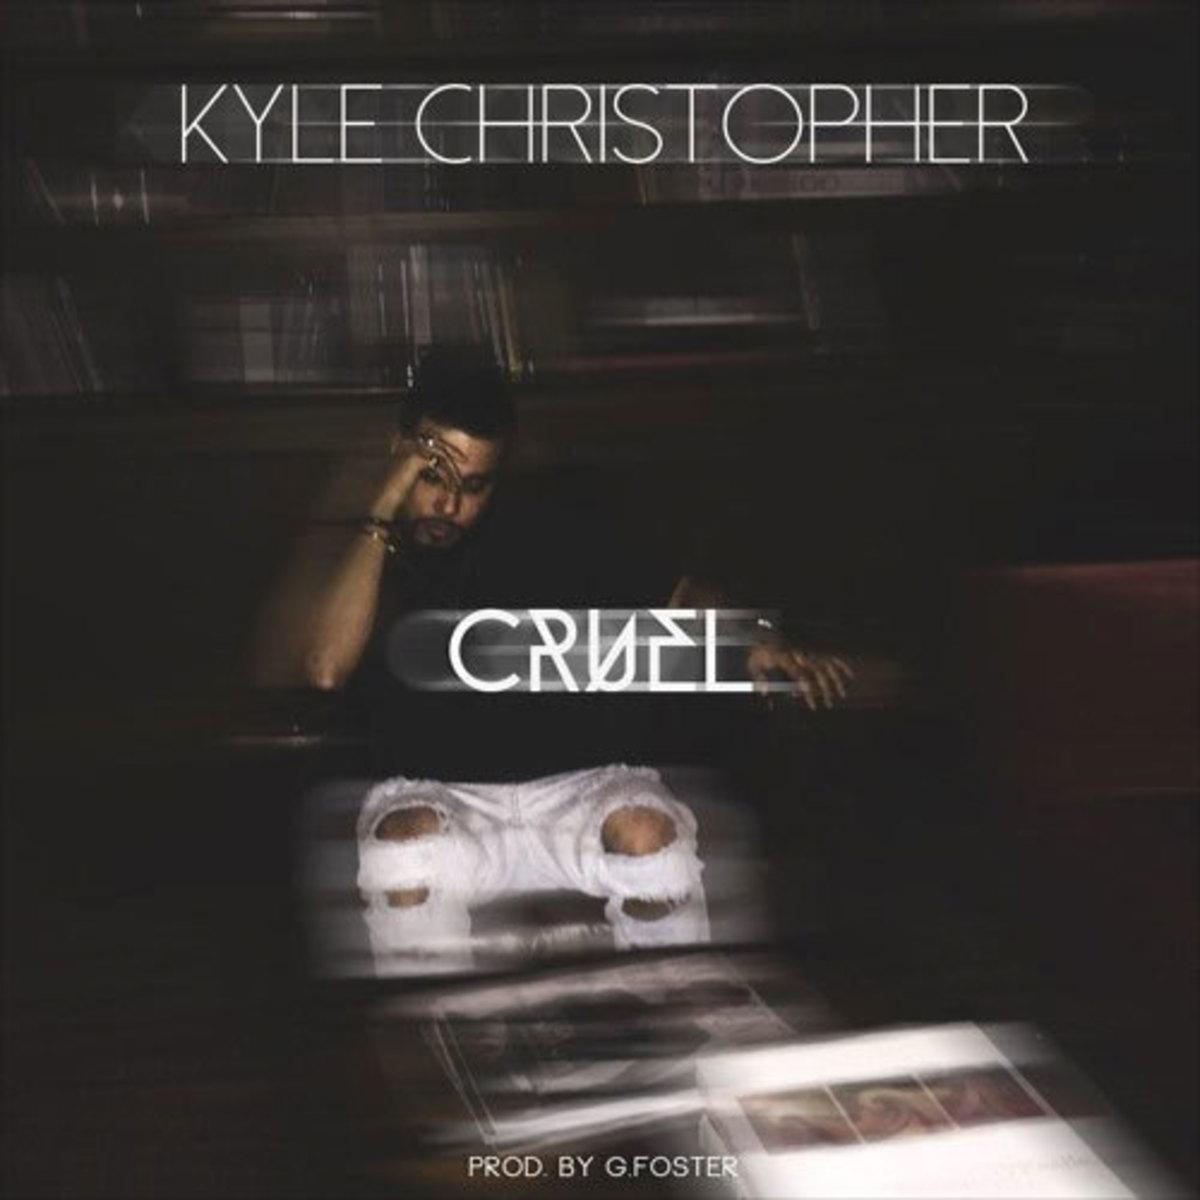 kyle-christopher-cruel.jpg